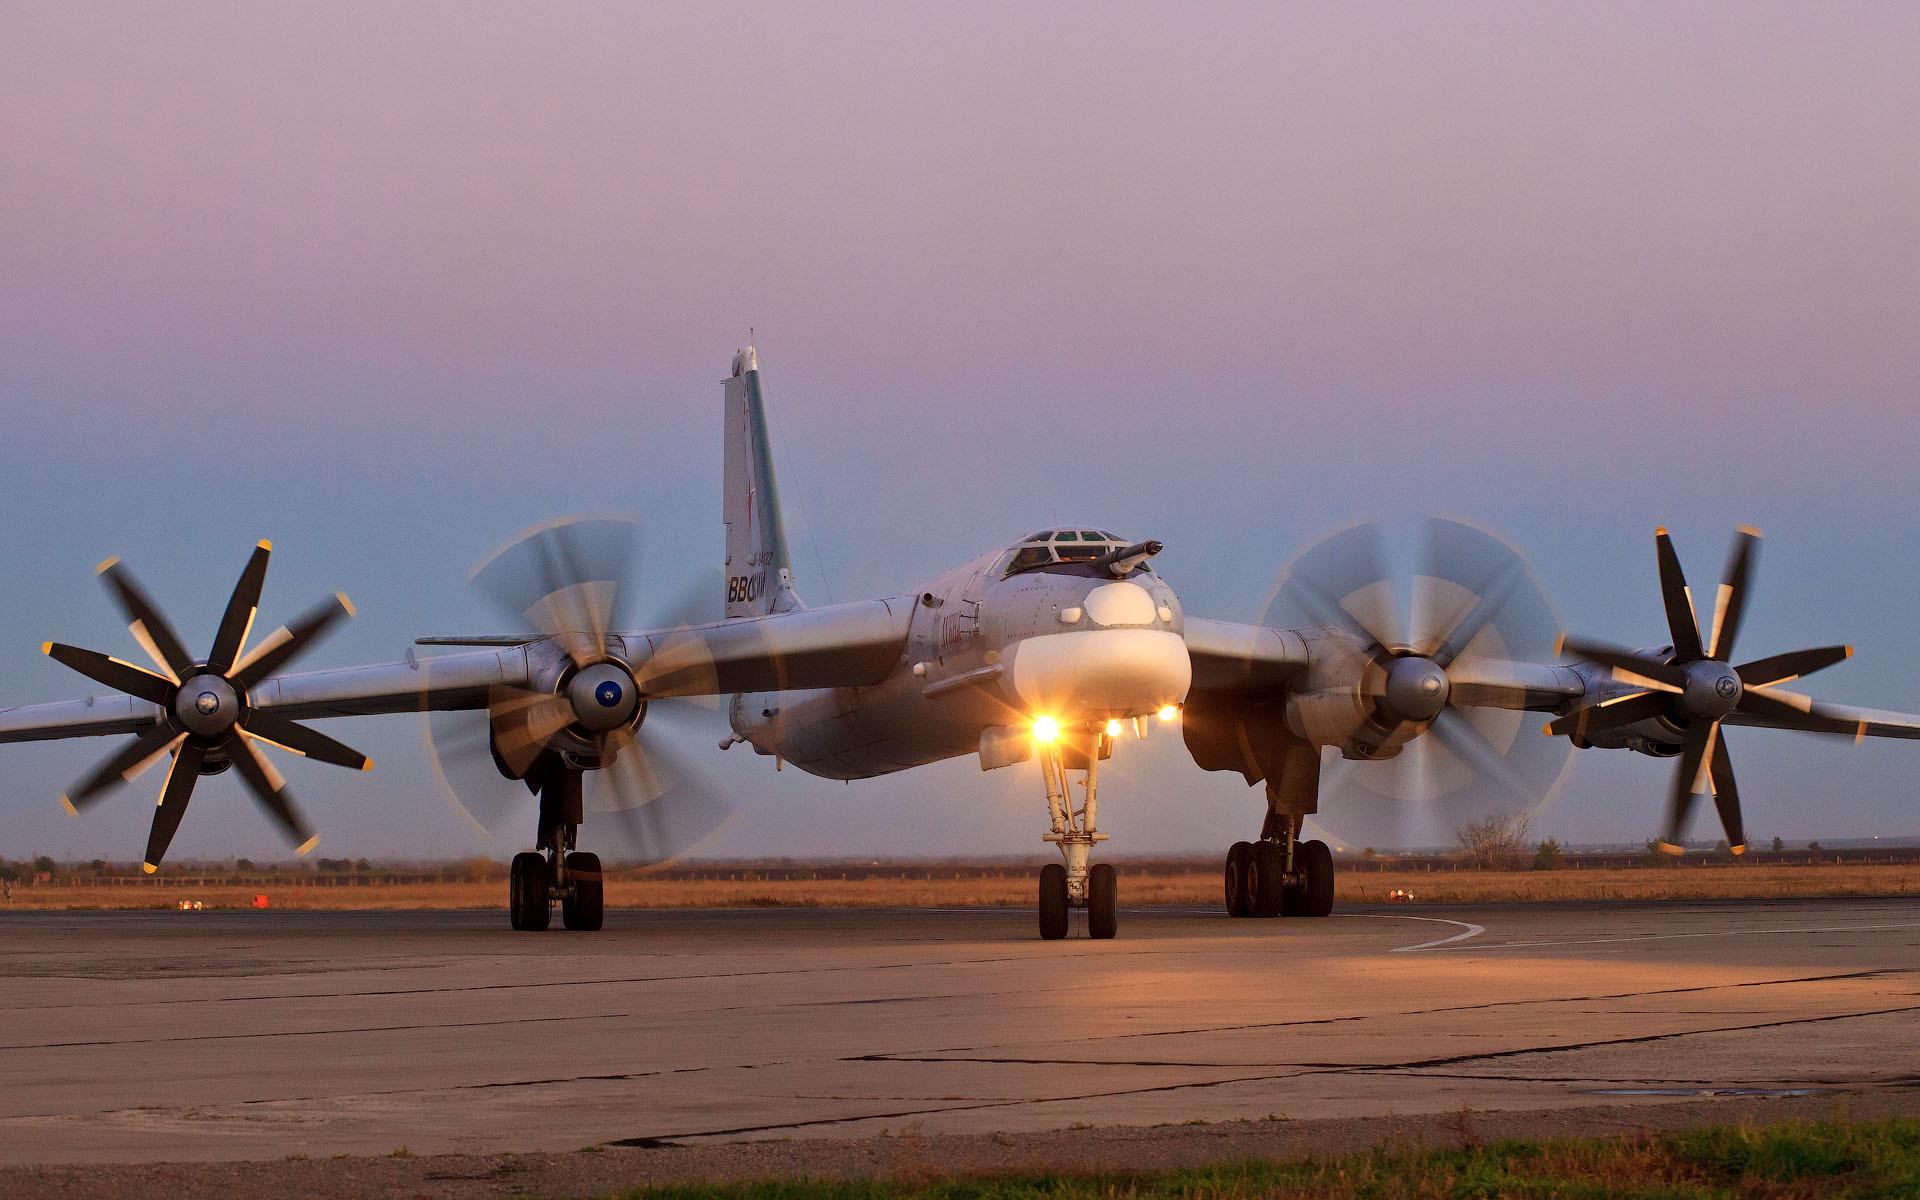 Tu 95MS Military Russia Air Force Airplane Wallpaper